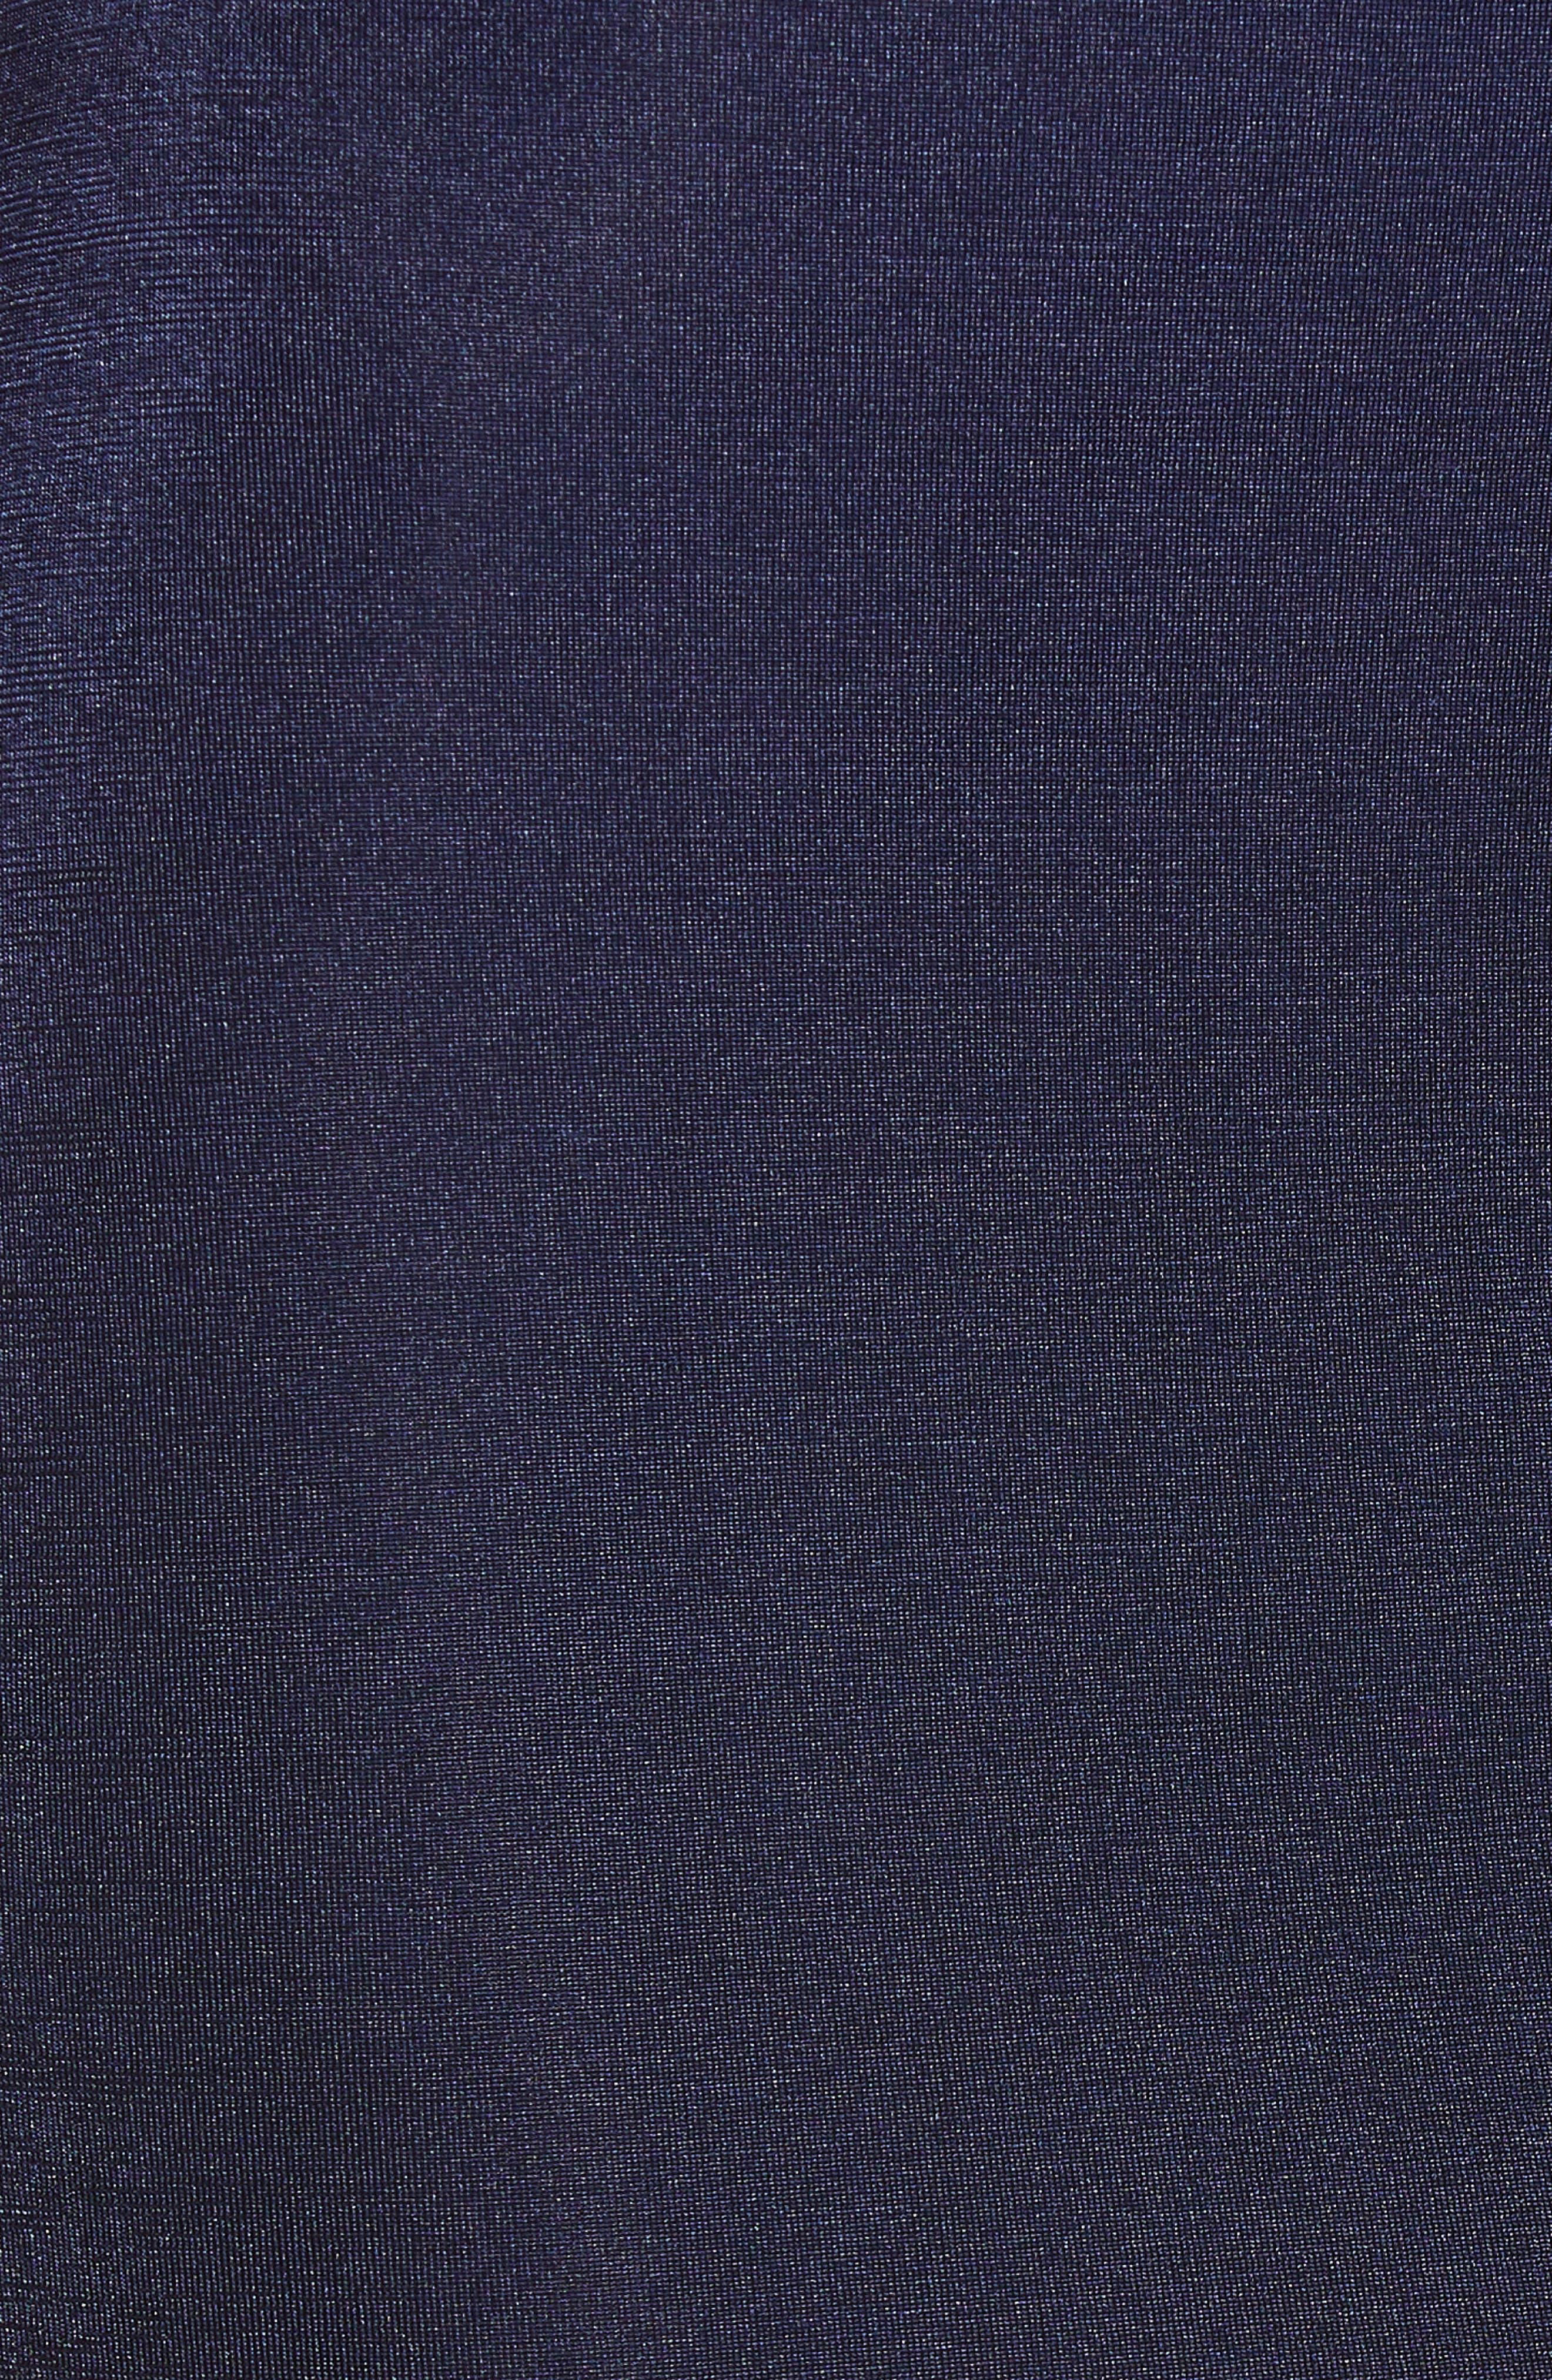 Cowl Neck Minidress,                             Alternate thumbnail 6, color,                             NAVY